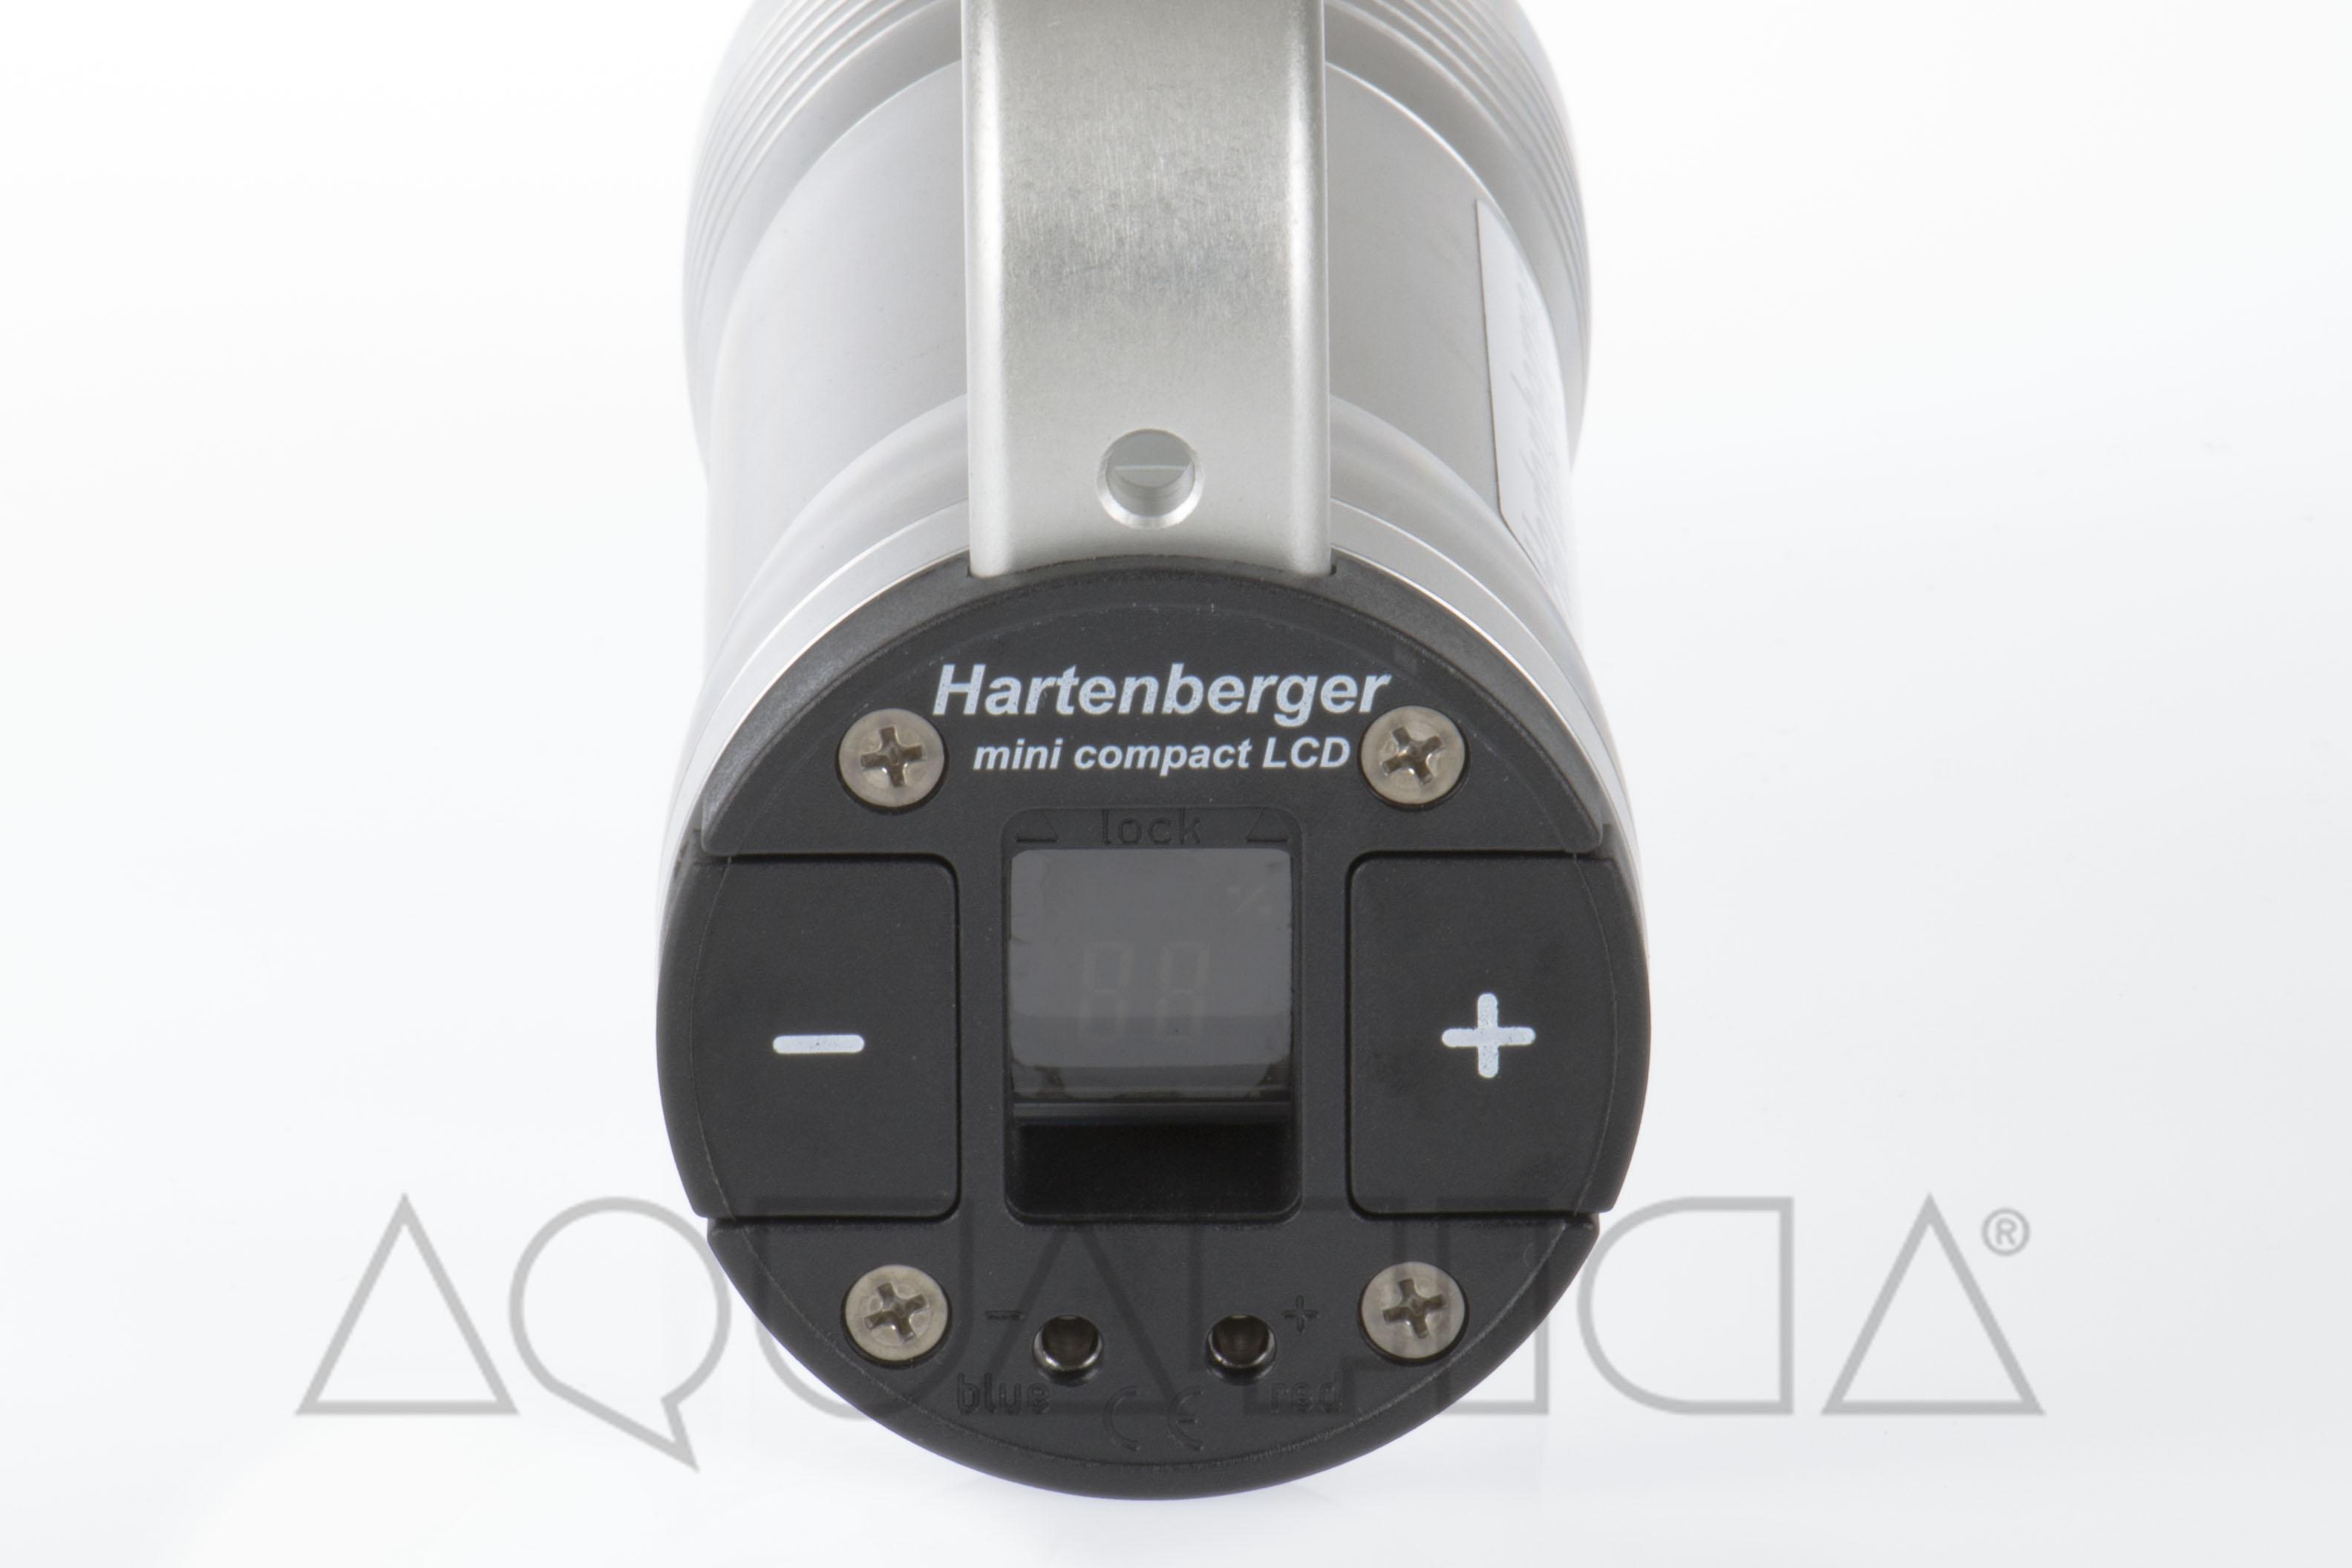 Illuminatore_Hartenberger_Minii_Compact_LCD_Blu_7Led_Spot_LiMn